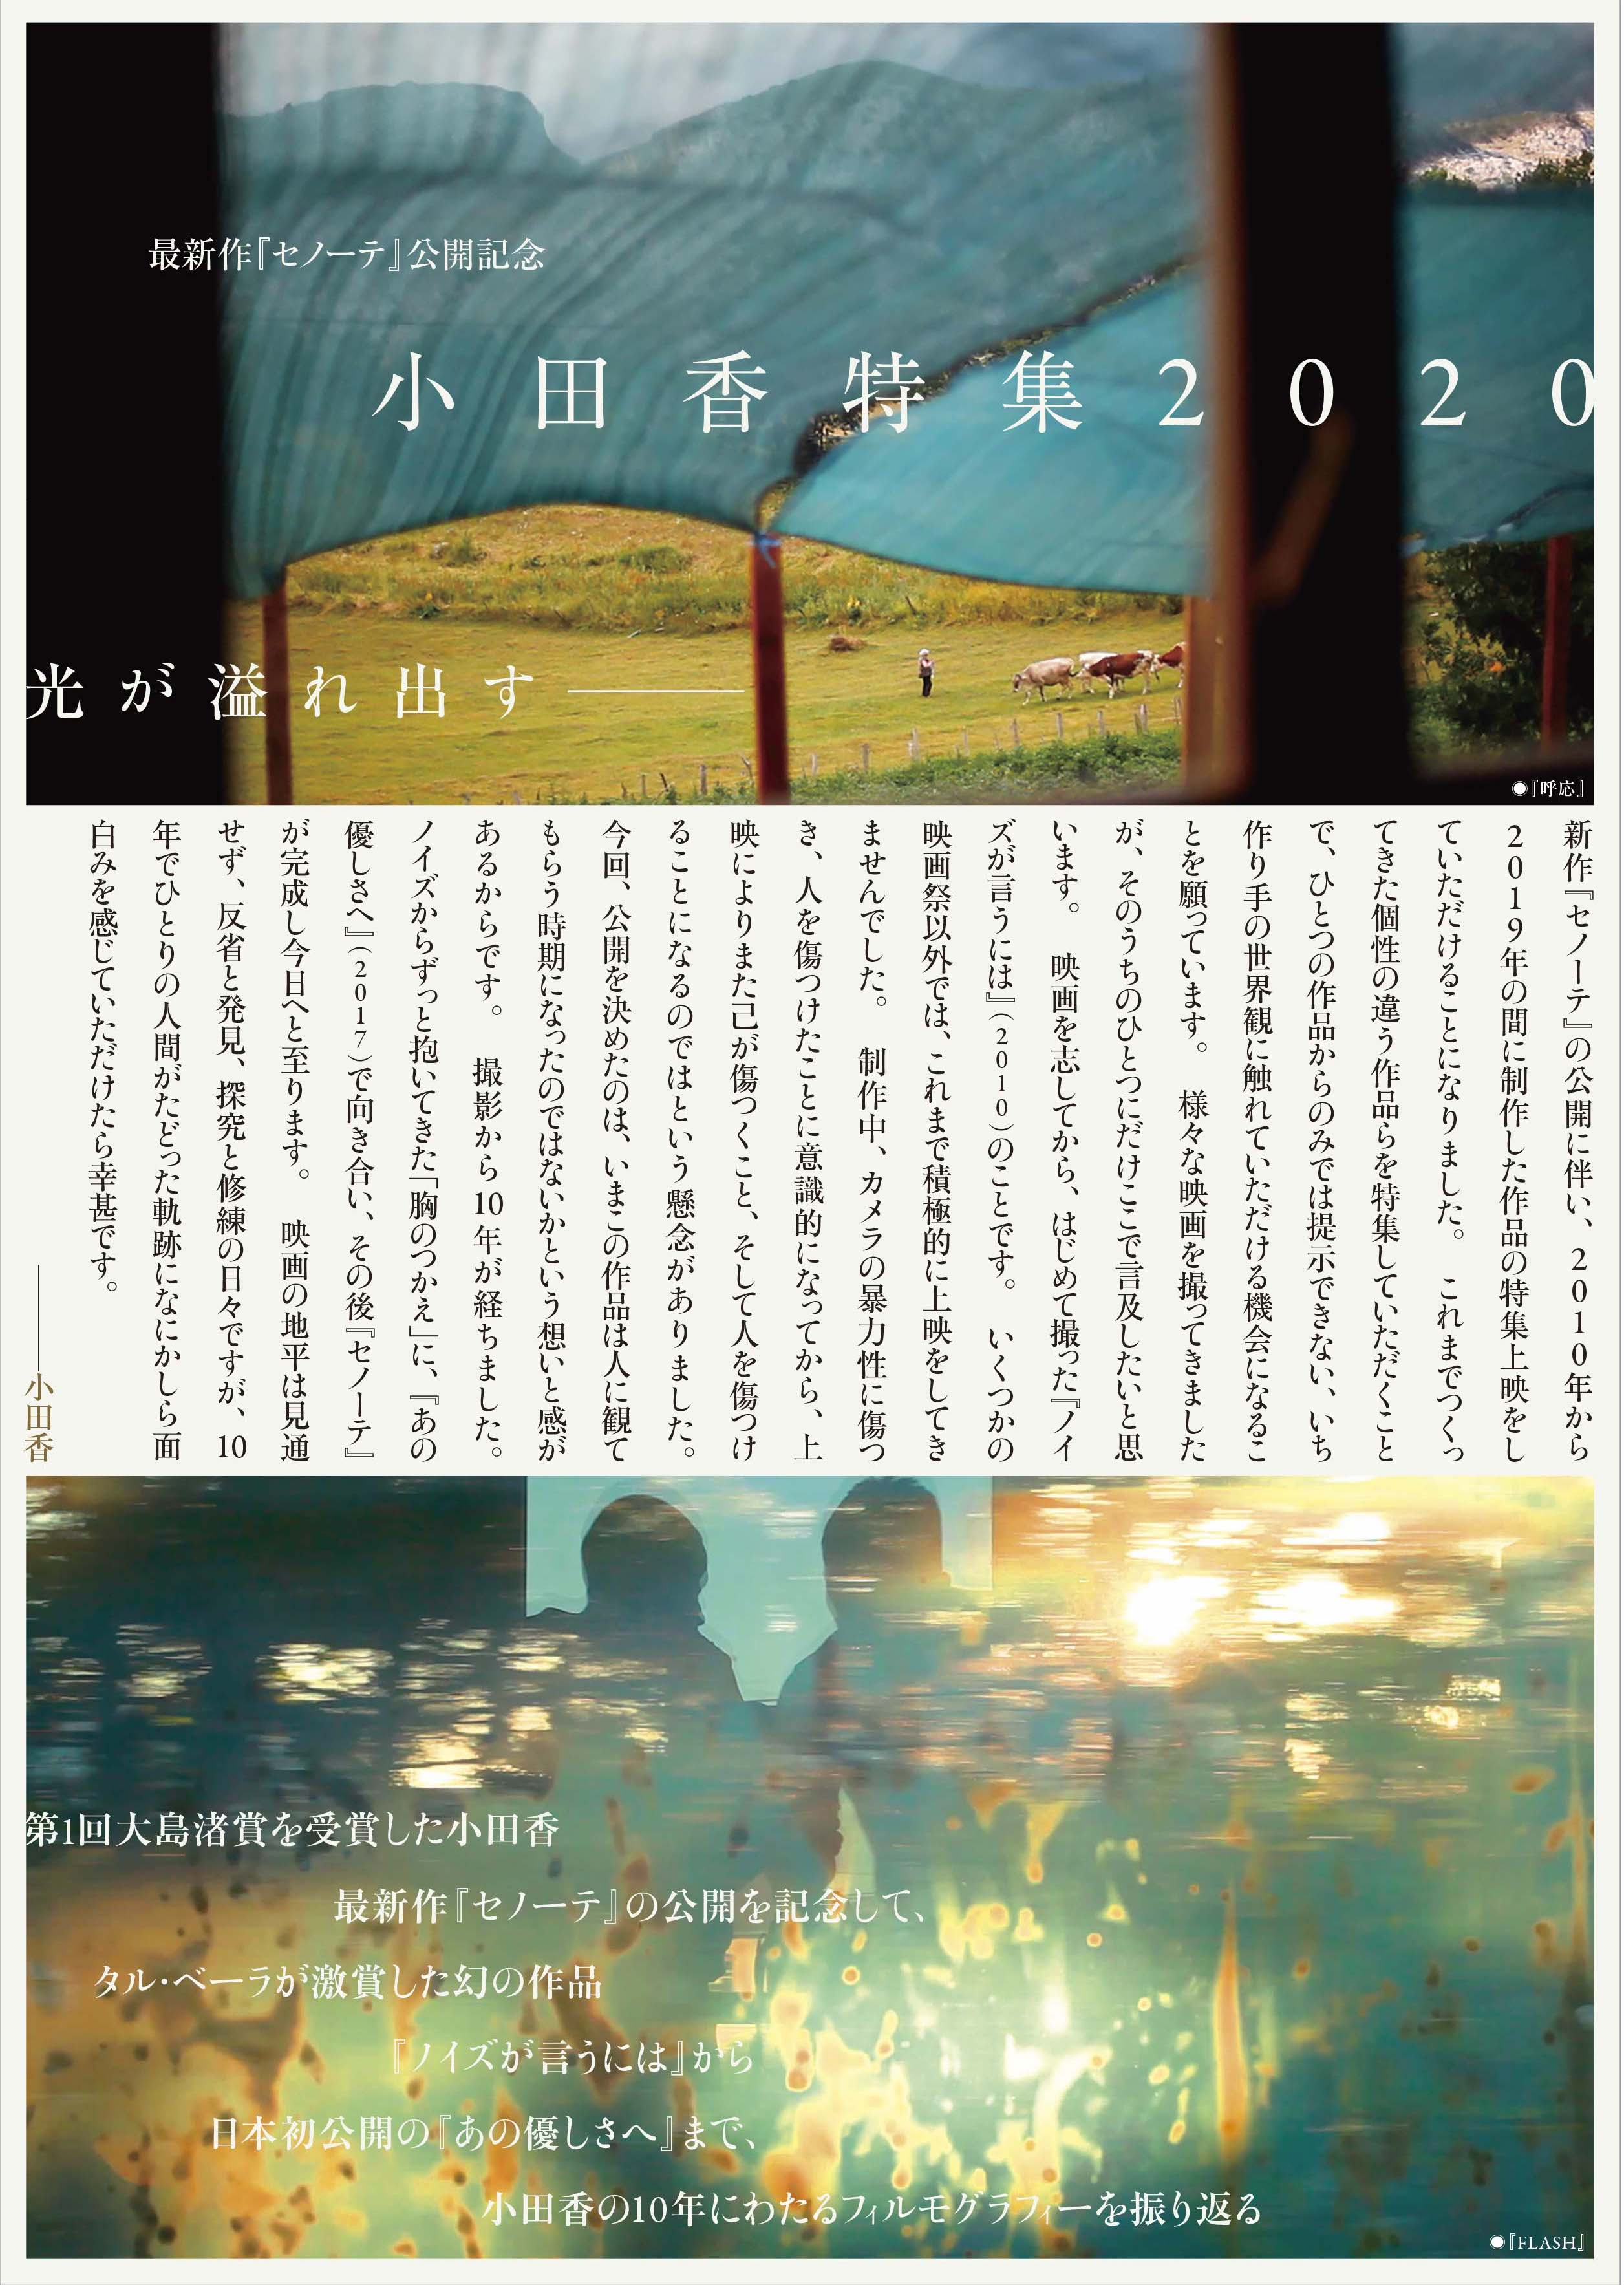 Oda_tokusyu_visual